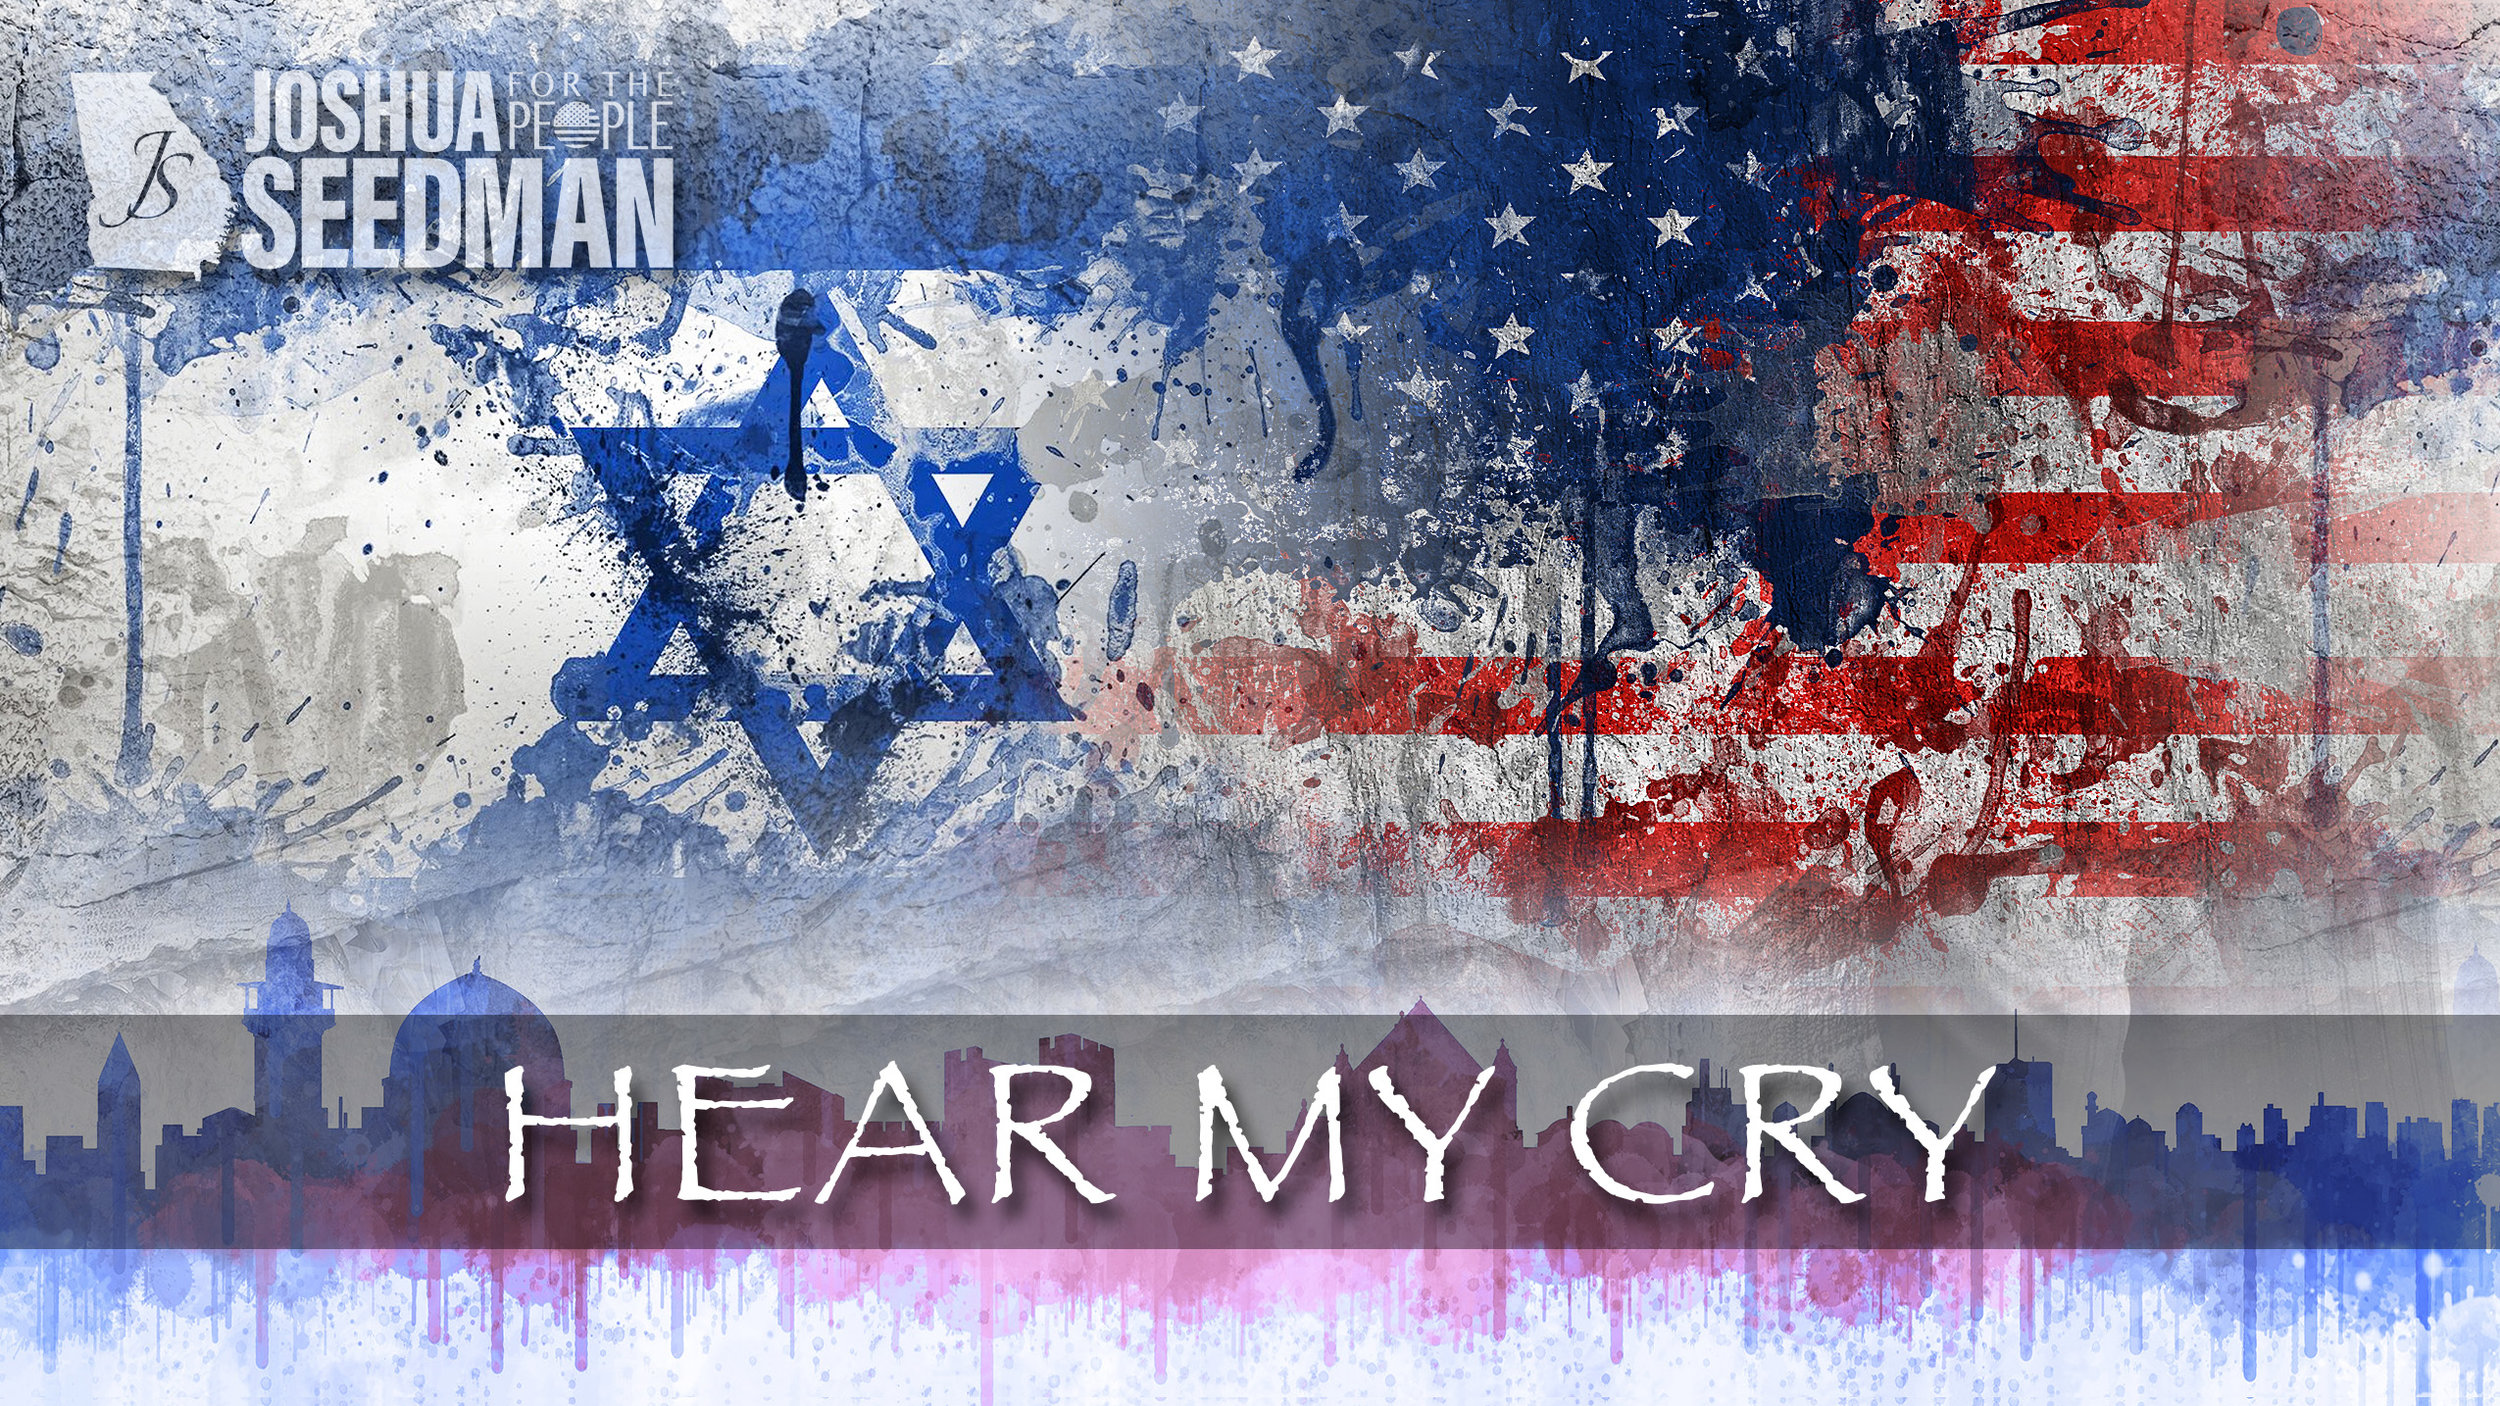 Hear My Cry Thumbnail (Joshua Seedman).jpg